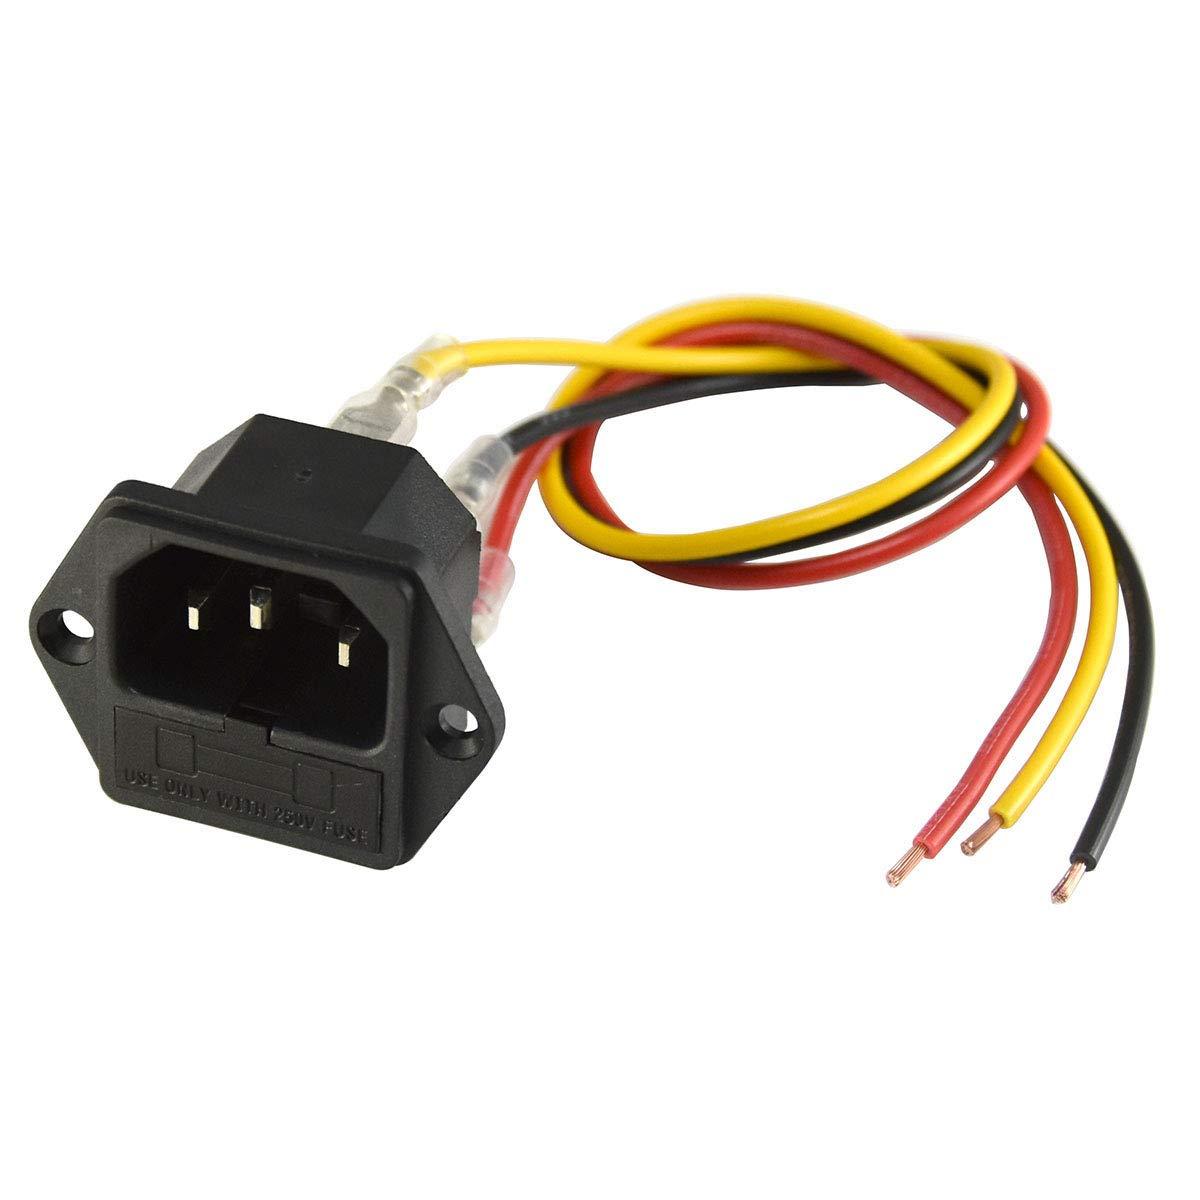 15a Fuse Box Connector   Go Wiring Diagrams Texture   Adapter Power Supply Fuse Box      ComunqueItalia